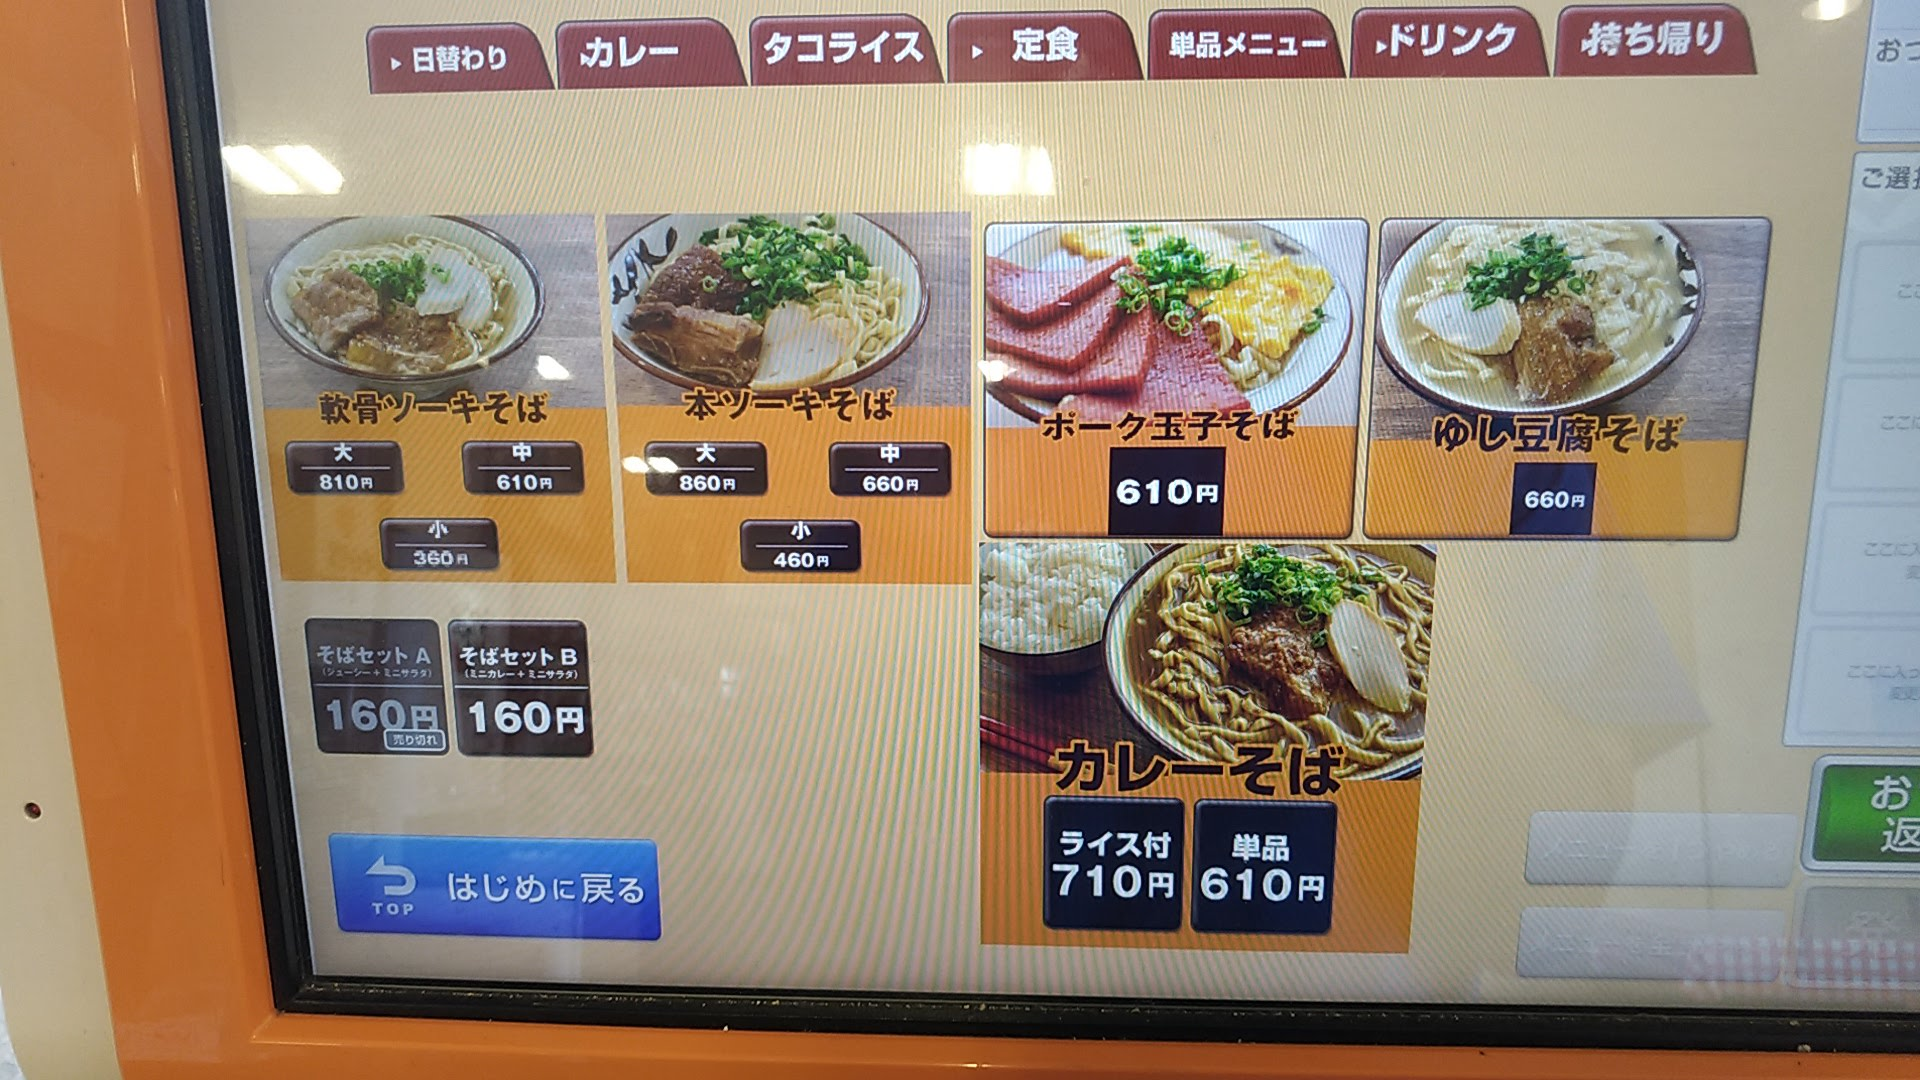 YONAR'S meal ticket machine 1